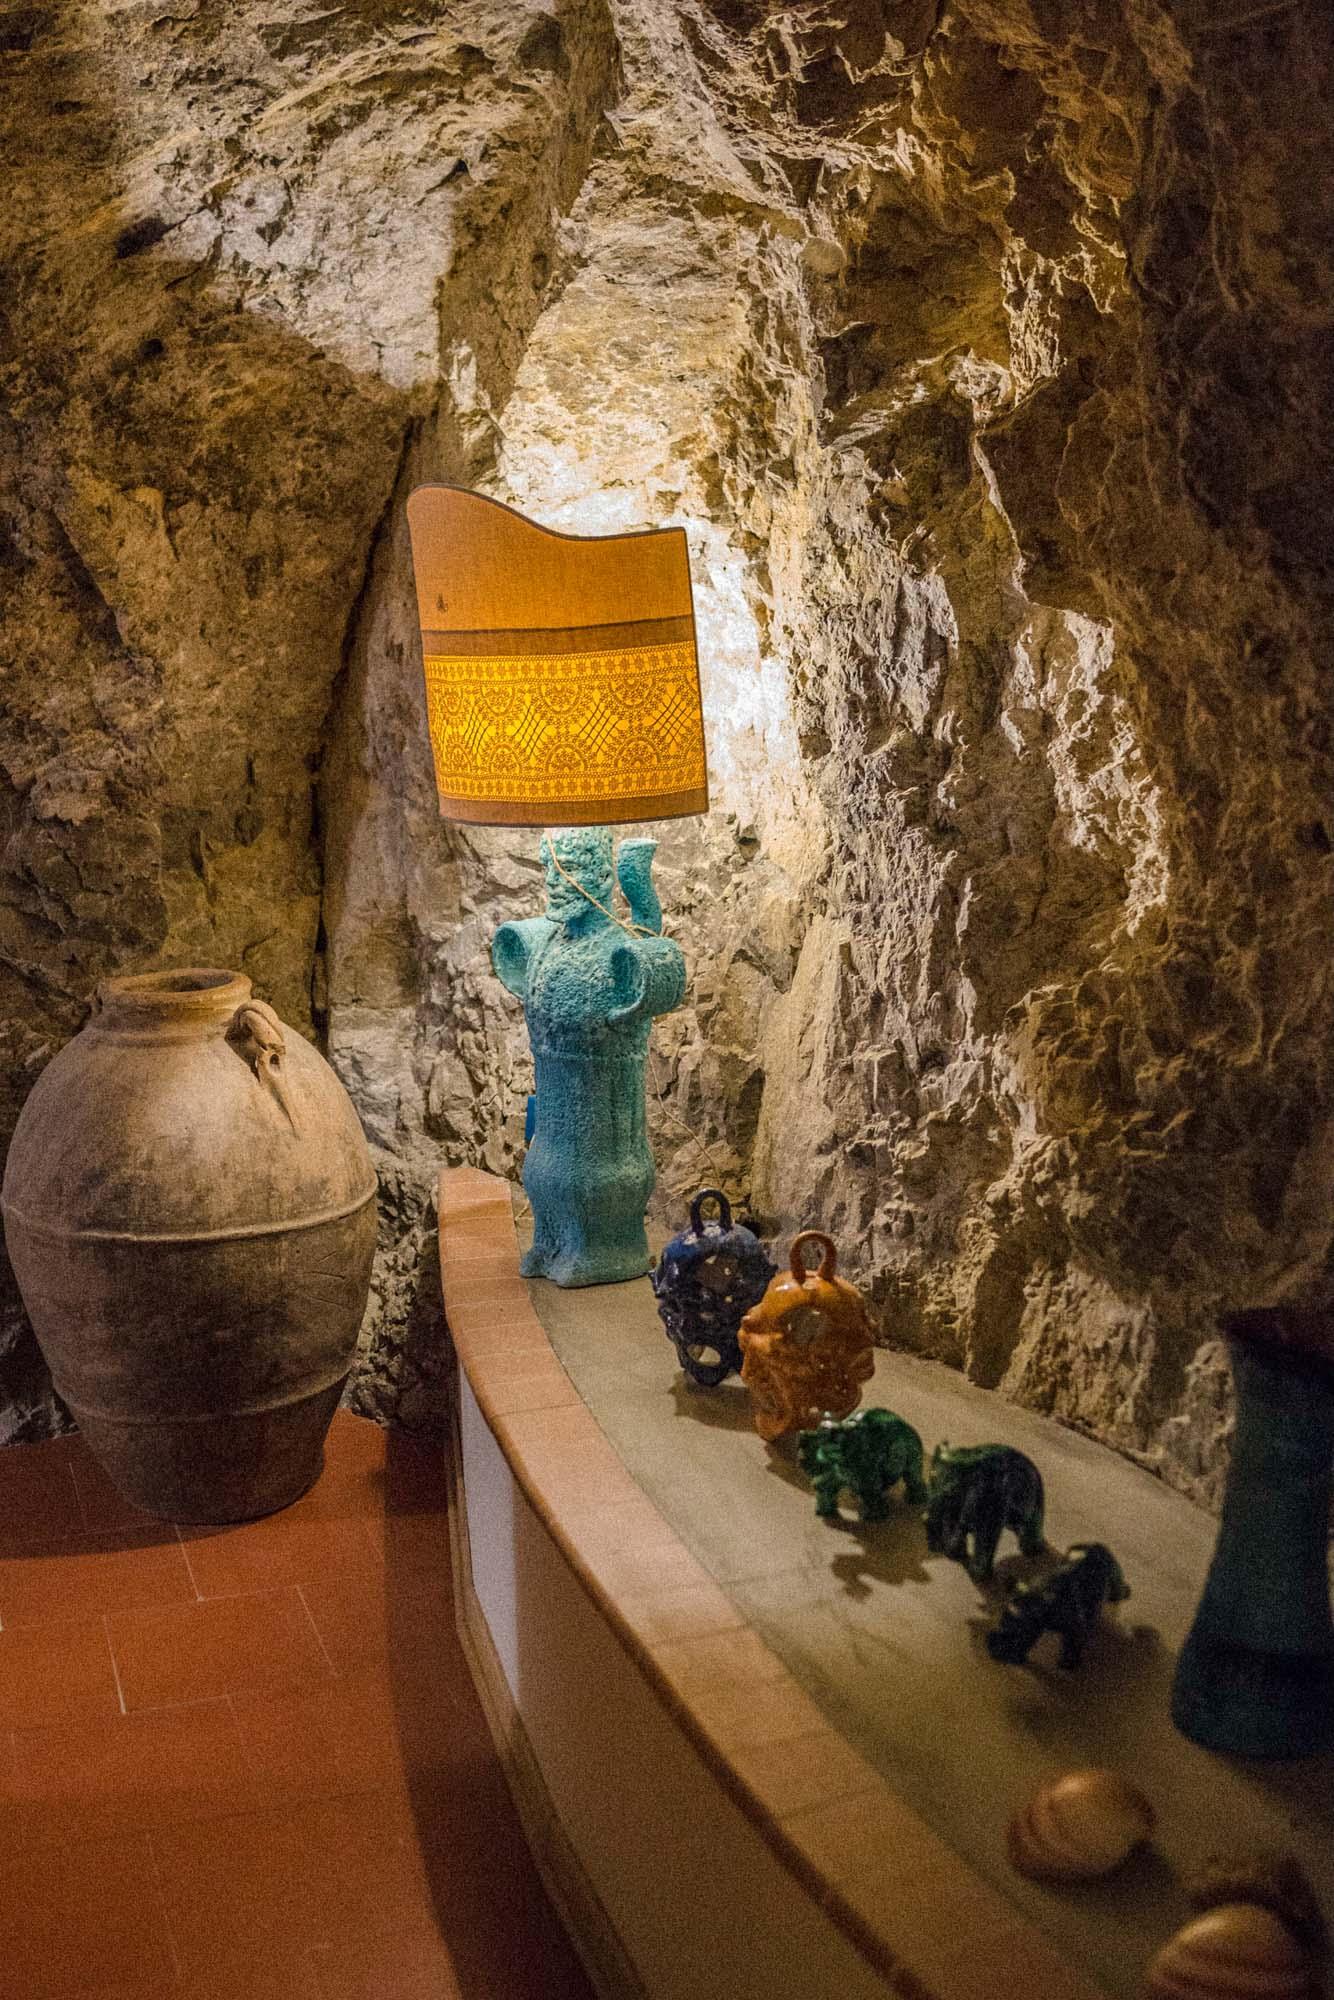 inside: vase in rock corridor